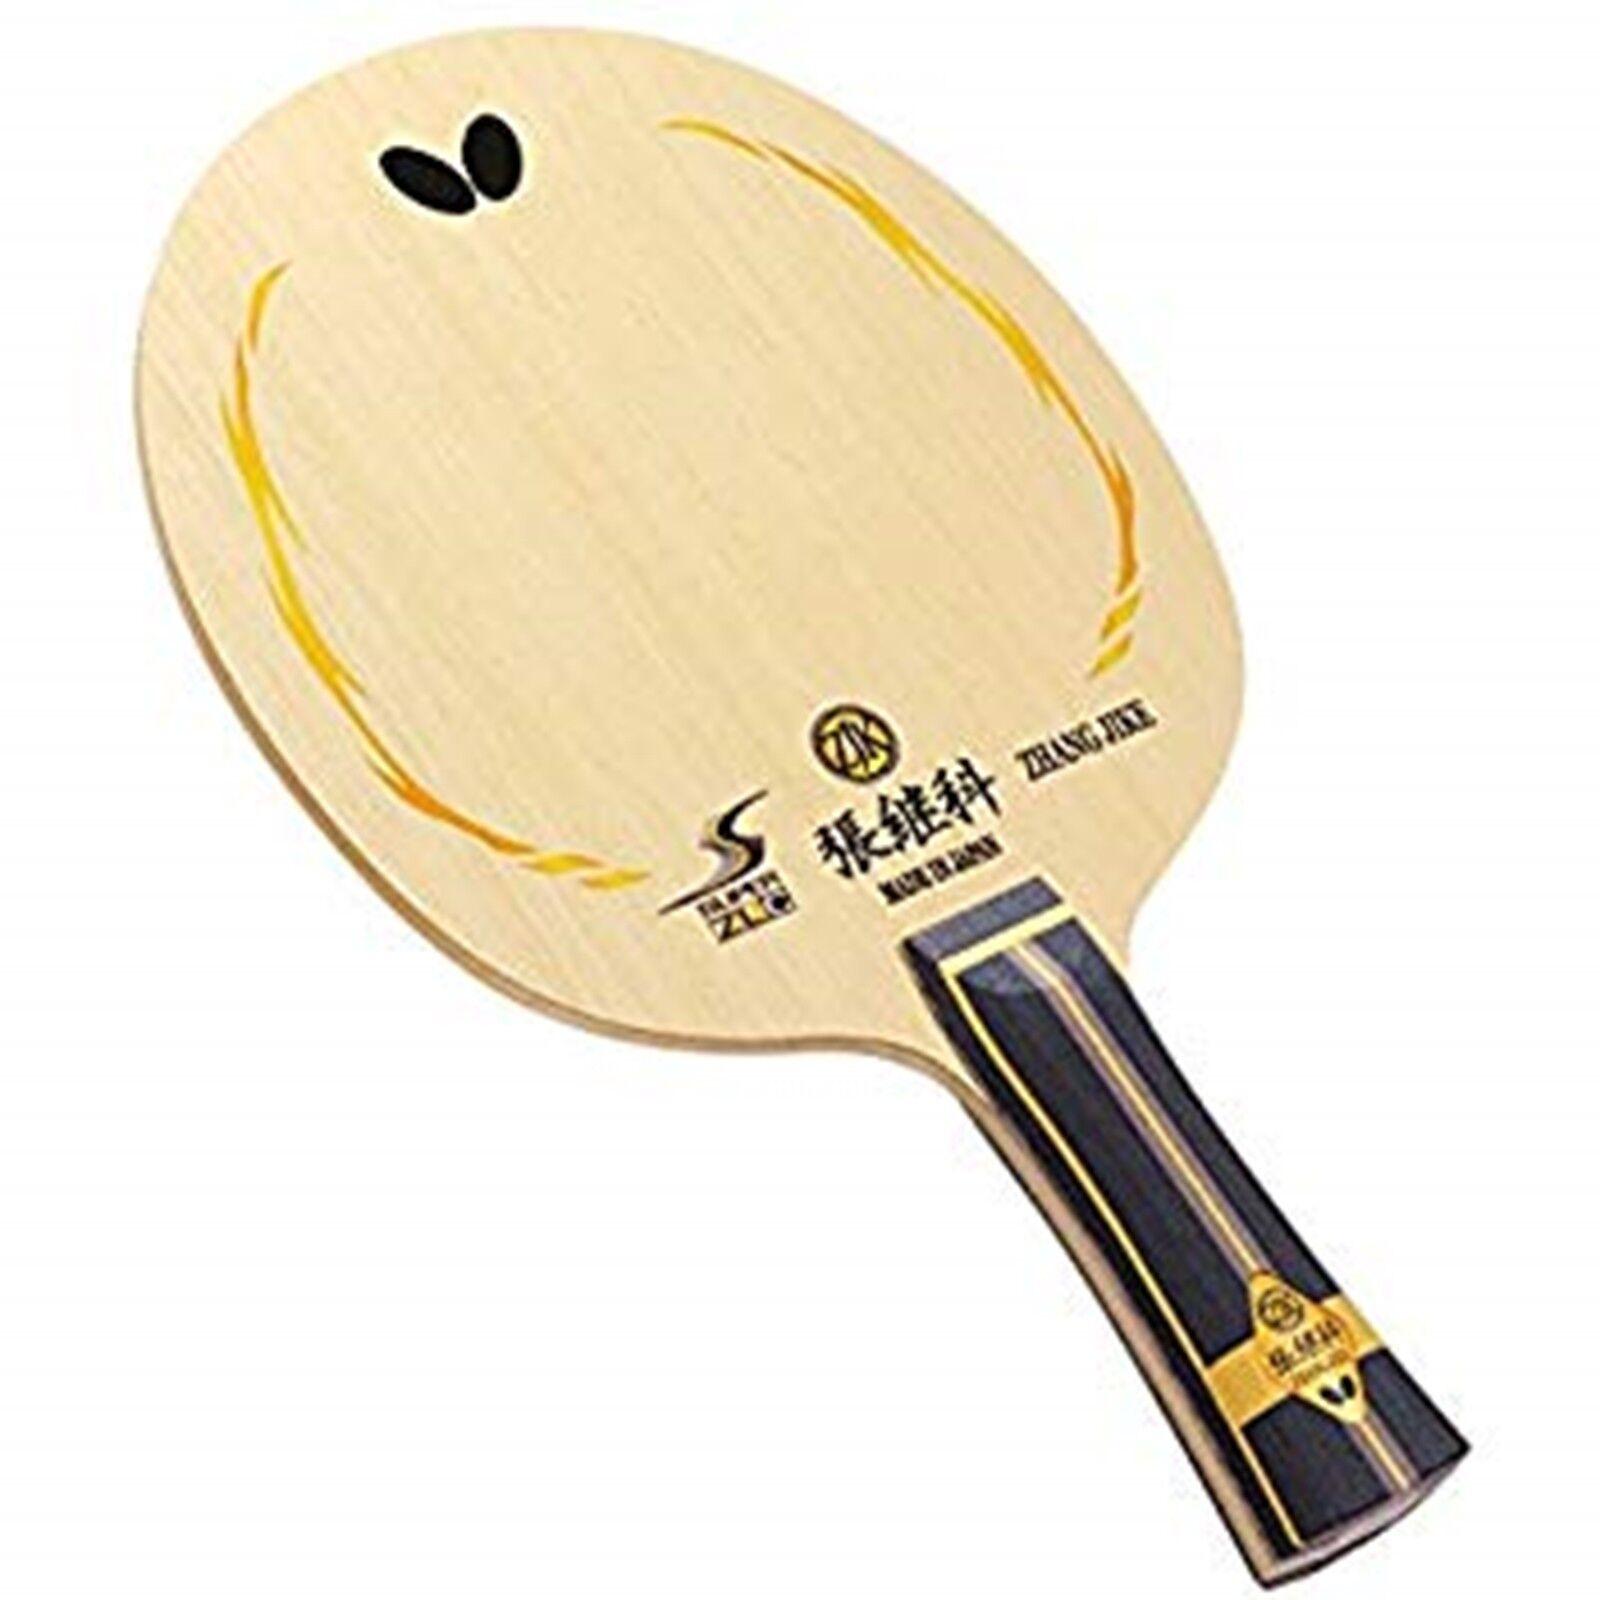 Butterfly Súper Zlc Zhang Jike Anzuelo 36541 Mesa Raqueta de Tenis Japan Nuevo